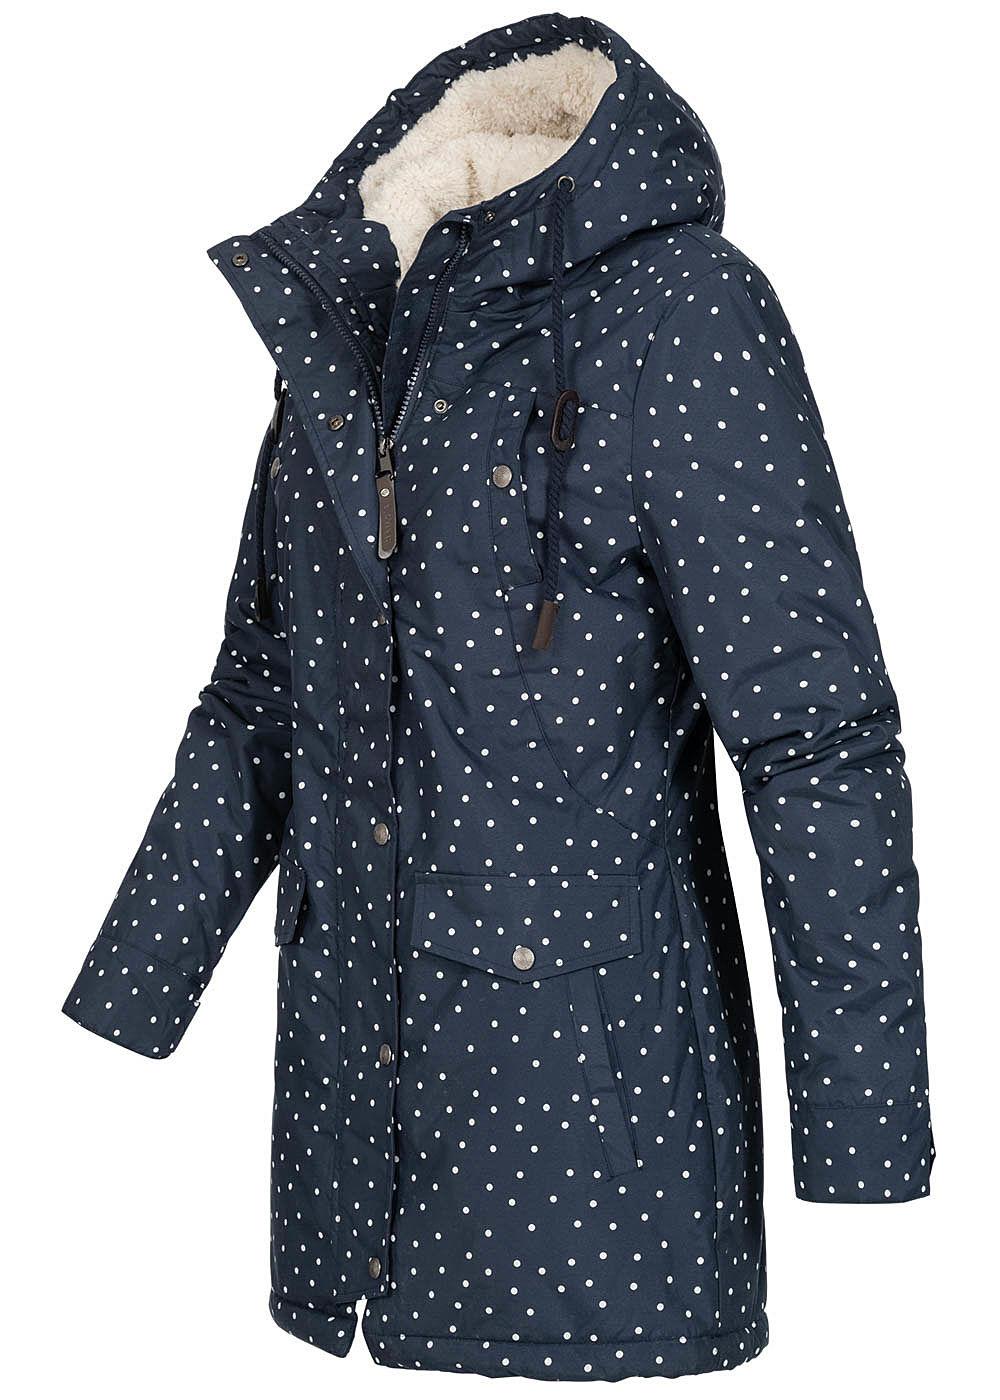 Damen Jacke Winter Blau Punkte 4 Hailys Navy Kapuze Muster Pockets Weiss Parka PuXTZOki